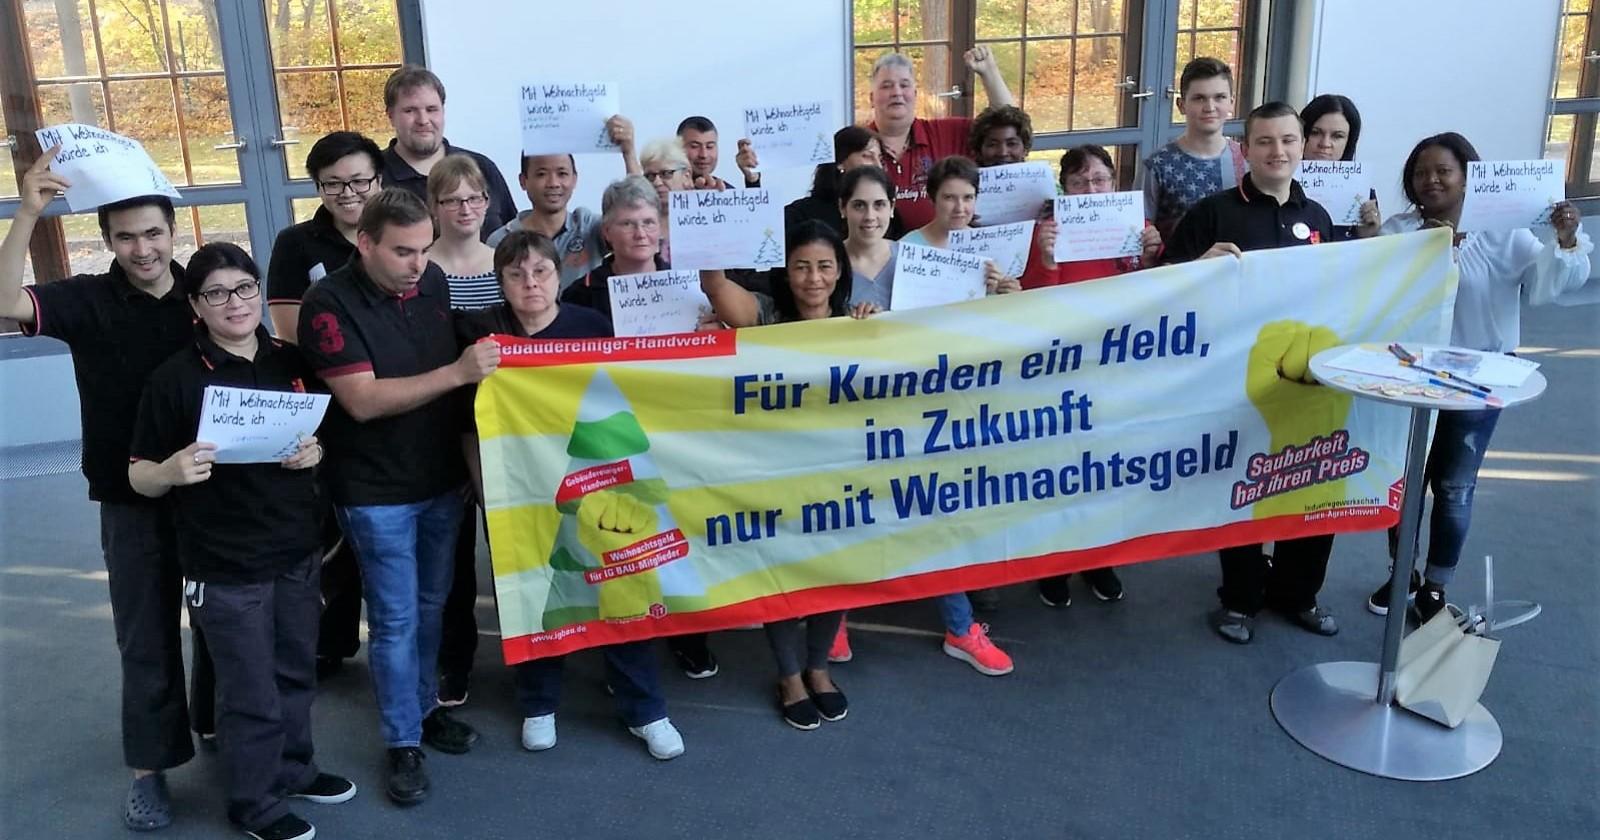 Piepenbrock-Abteilungsversammlung im Potsdamer Kongresshotel – Arbeitgeber reagiert, Beschäftigte aber auch!